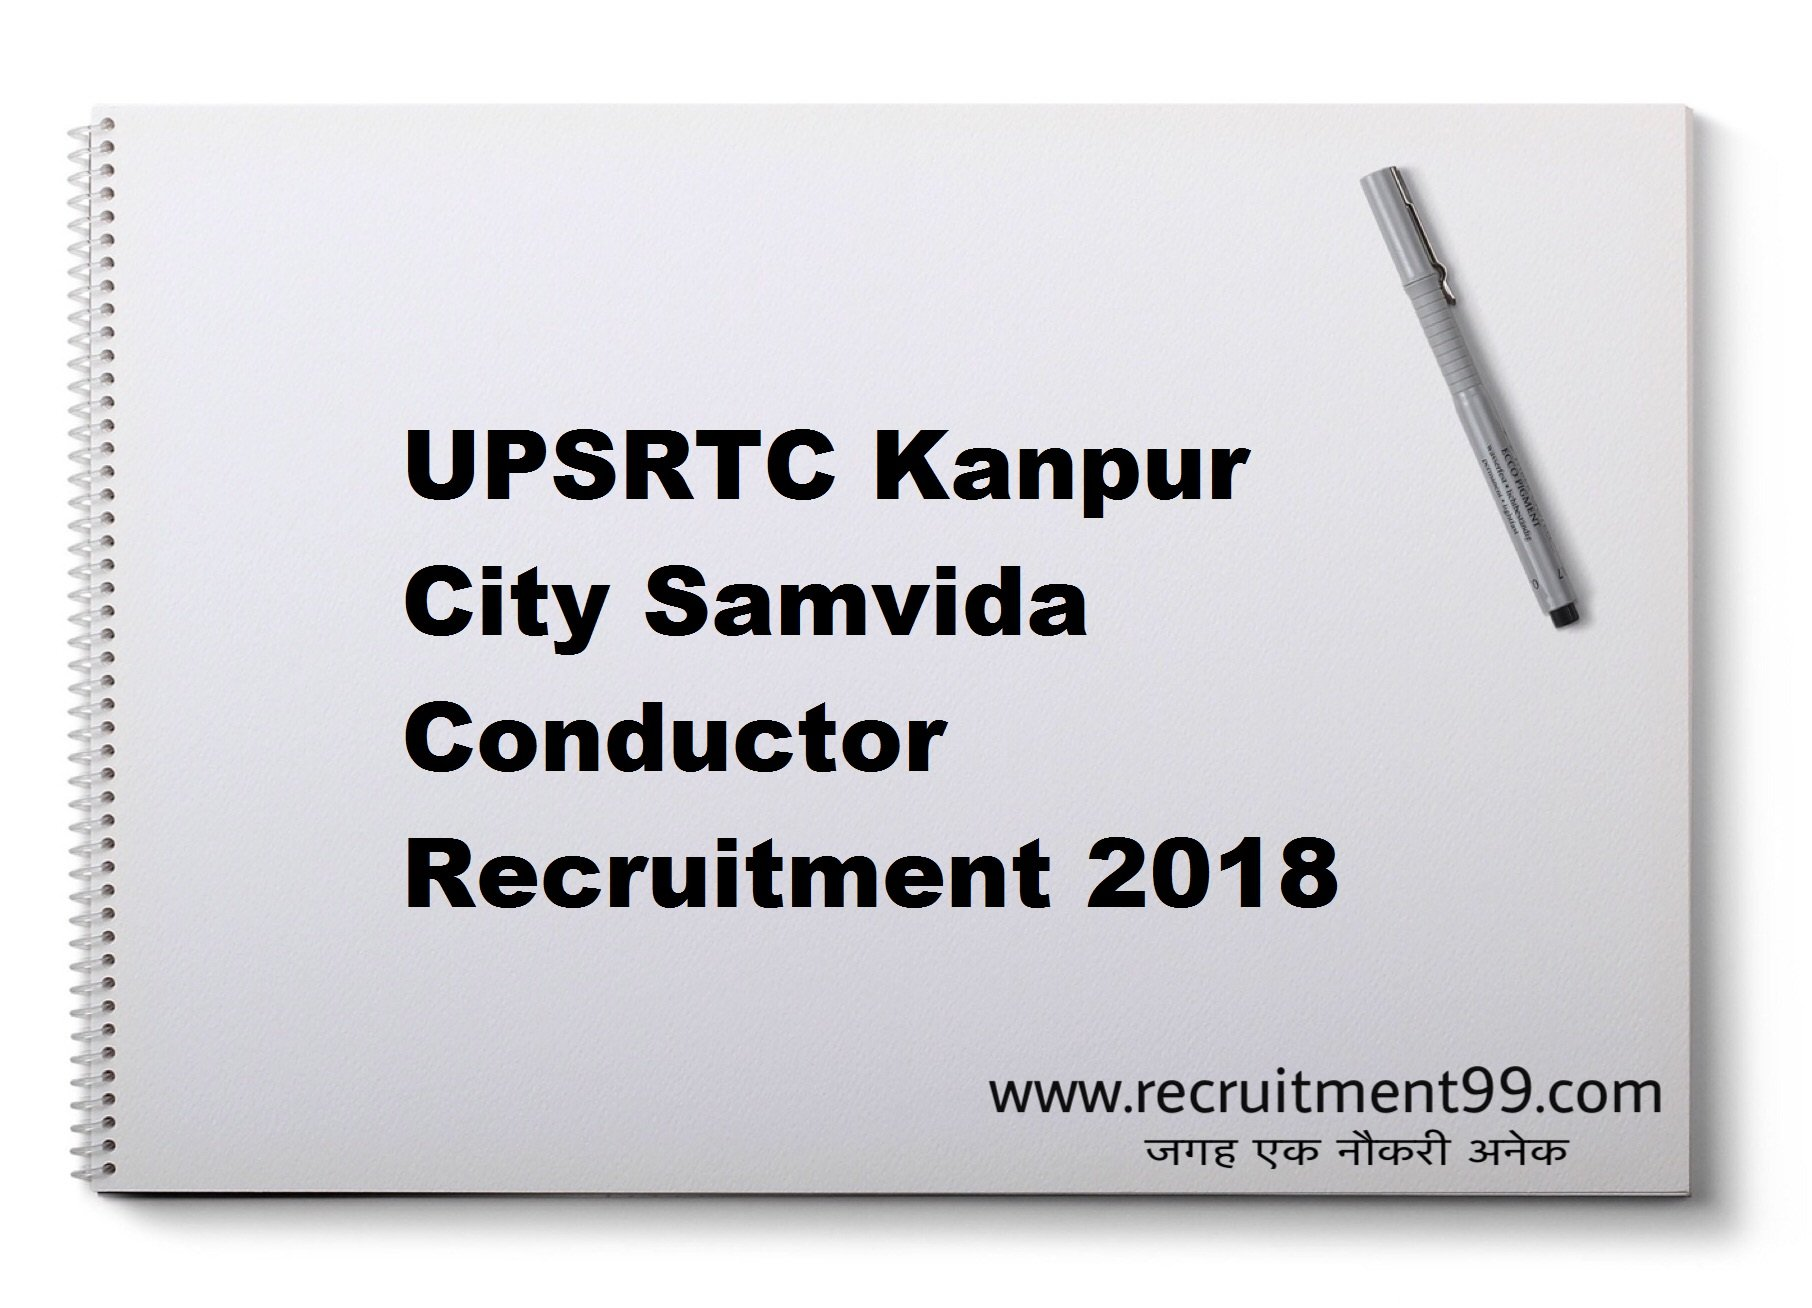 UPSRTC Kanpur City Samvida Conductor Recruitment Admit Card Result 2018